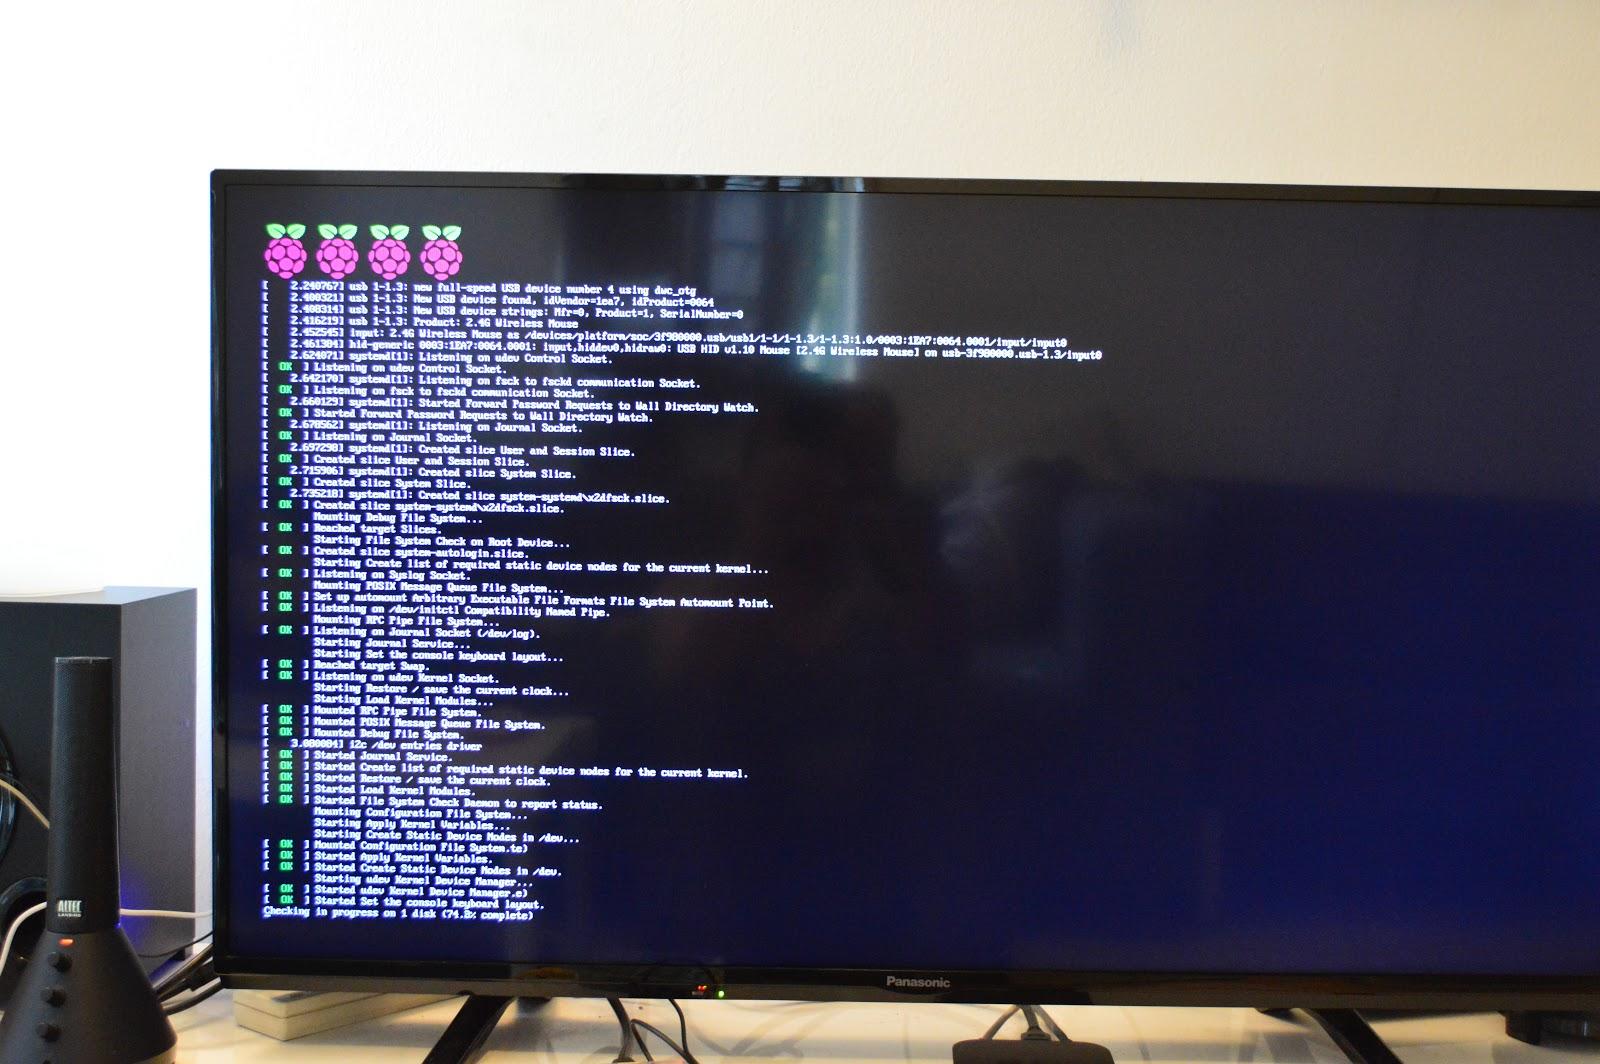 afifplc: Raspberry Pi 3 Model B review